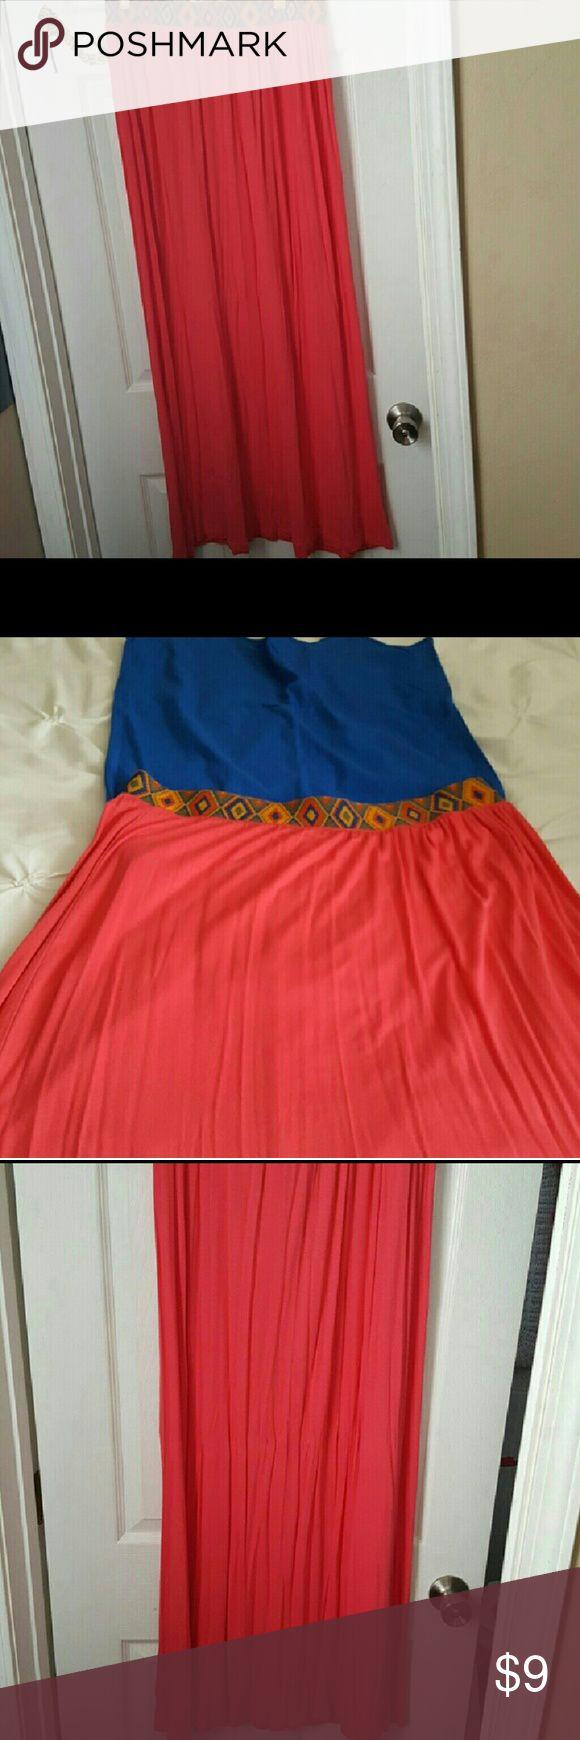 Maxi skirt Orange maxi skirt Skirts